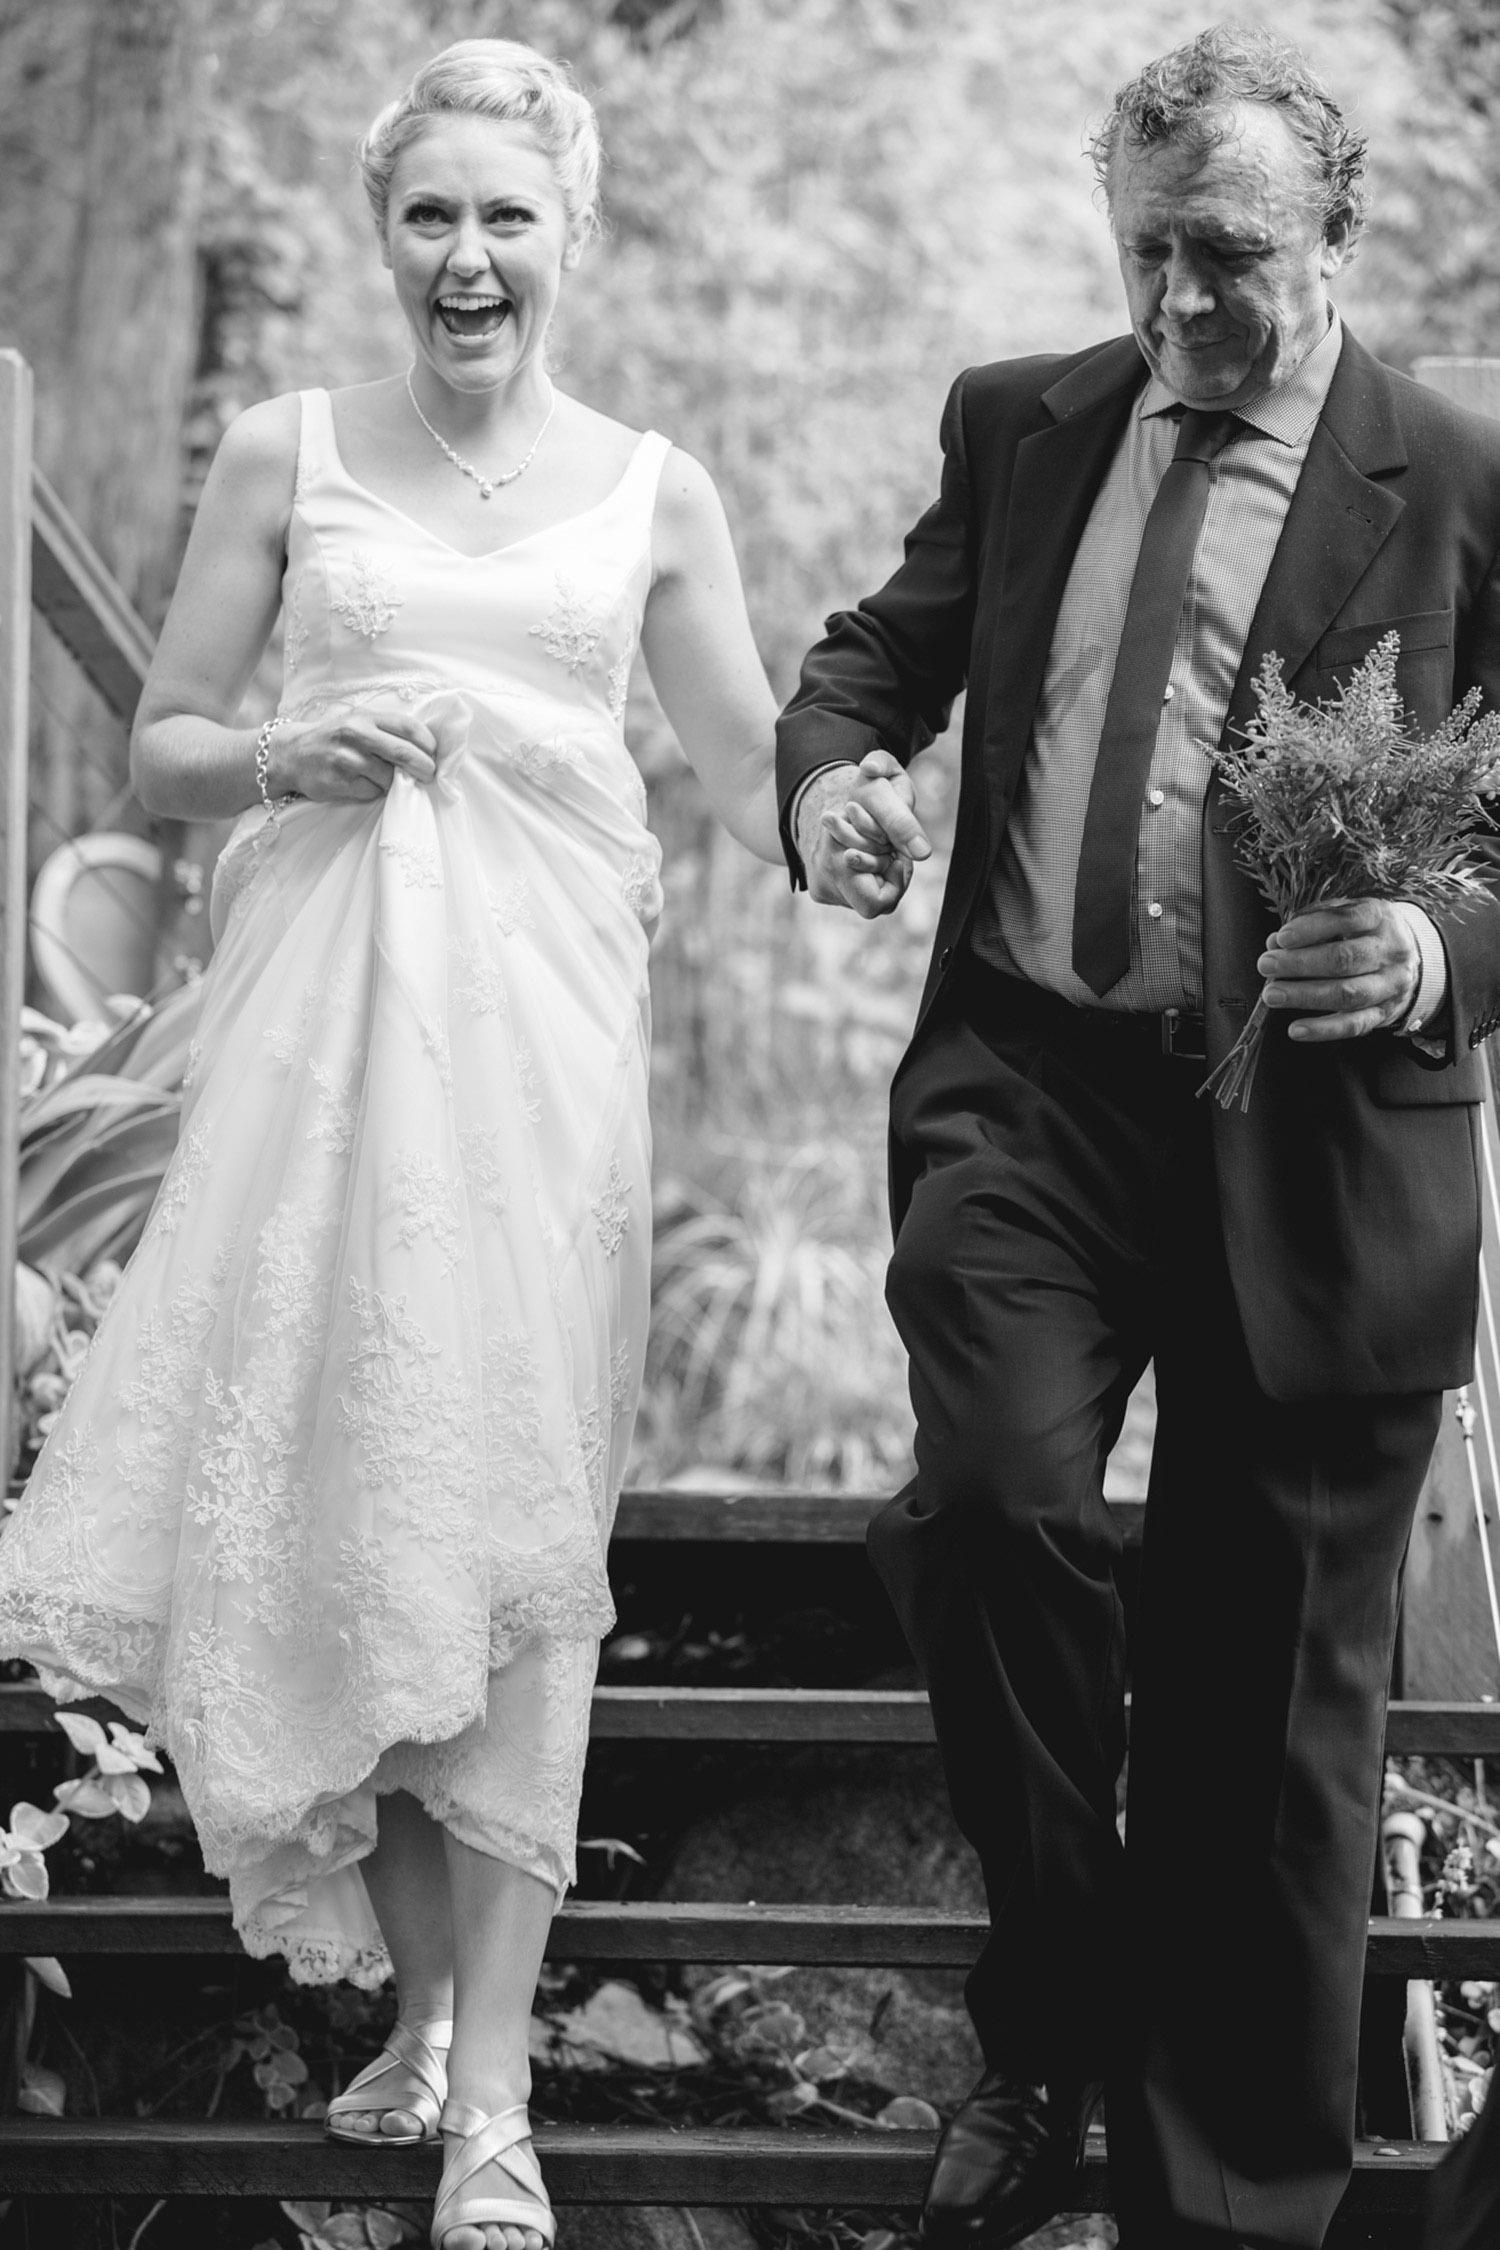 26-sunshine-coast-wedding-photography-all-the-love-in-the-world-noosa-mooloolaba-glasshouse-brisbane-katie-ryan5101.jpg